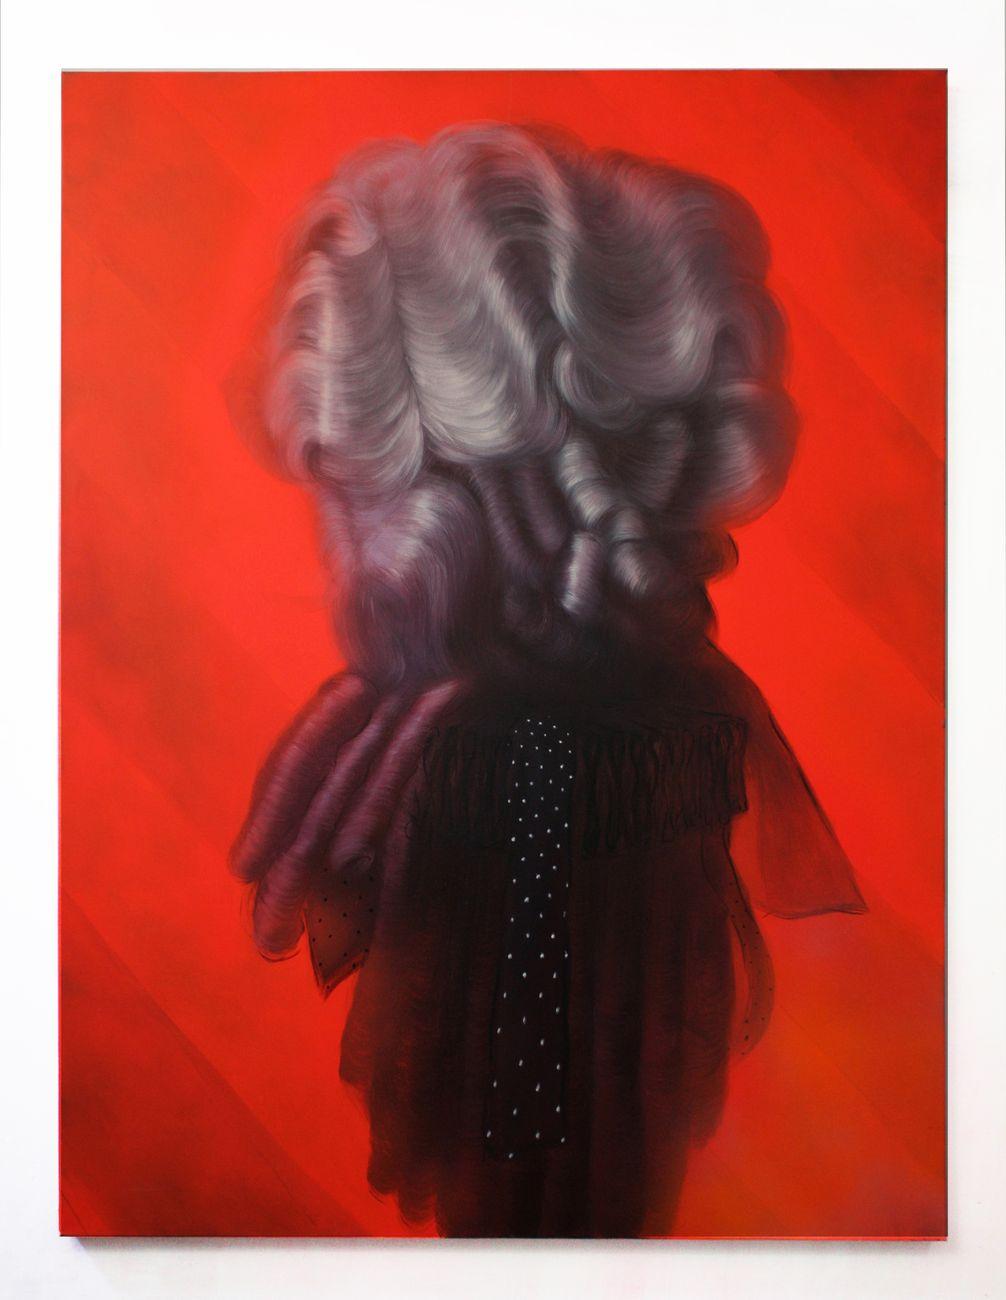 Bea Scaccia, I have no color, 2020